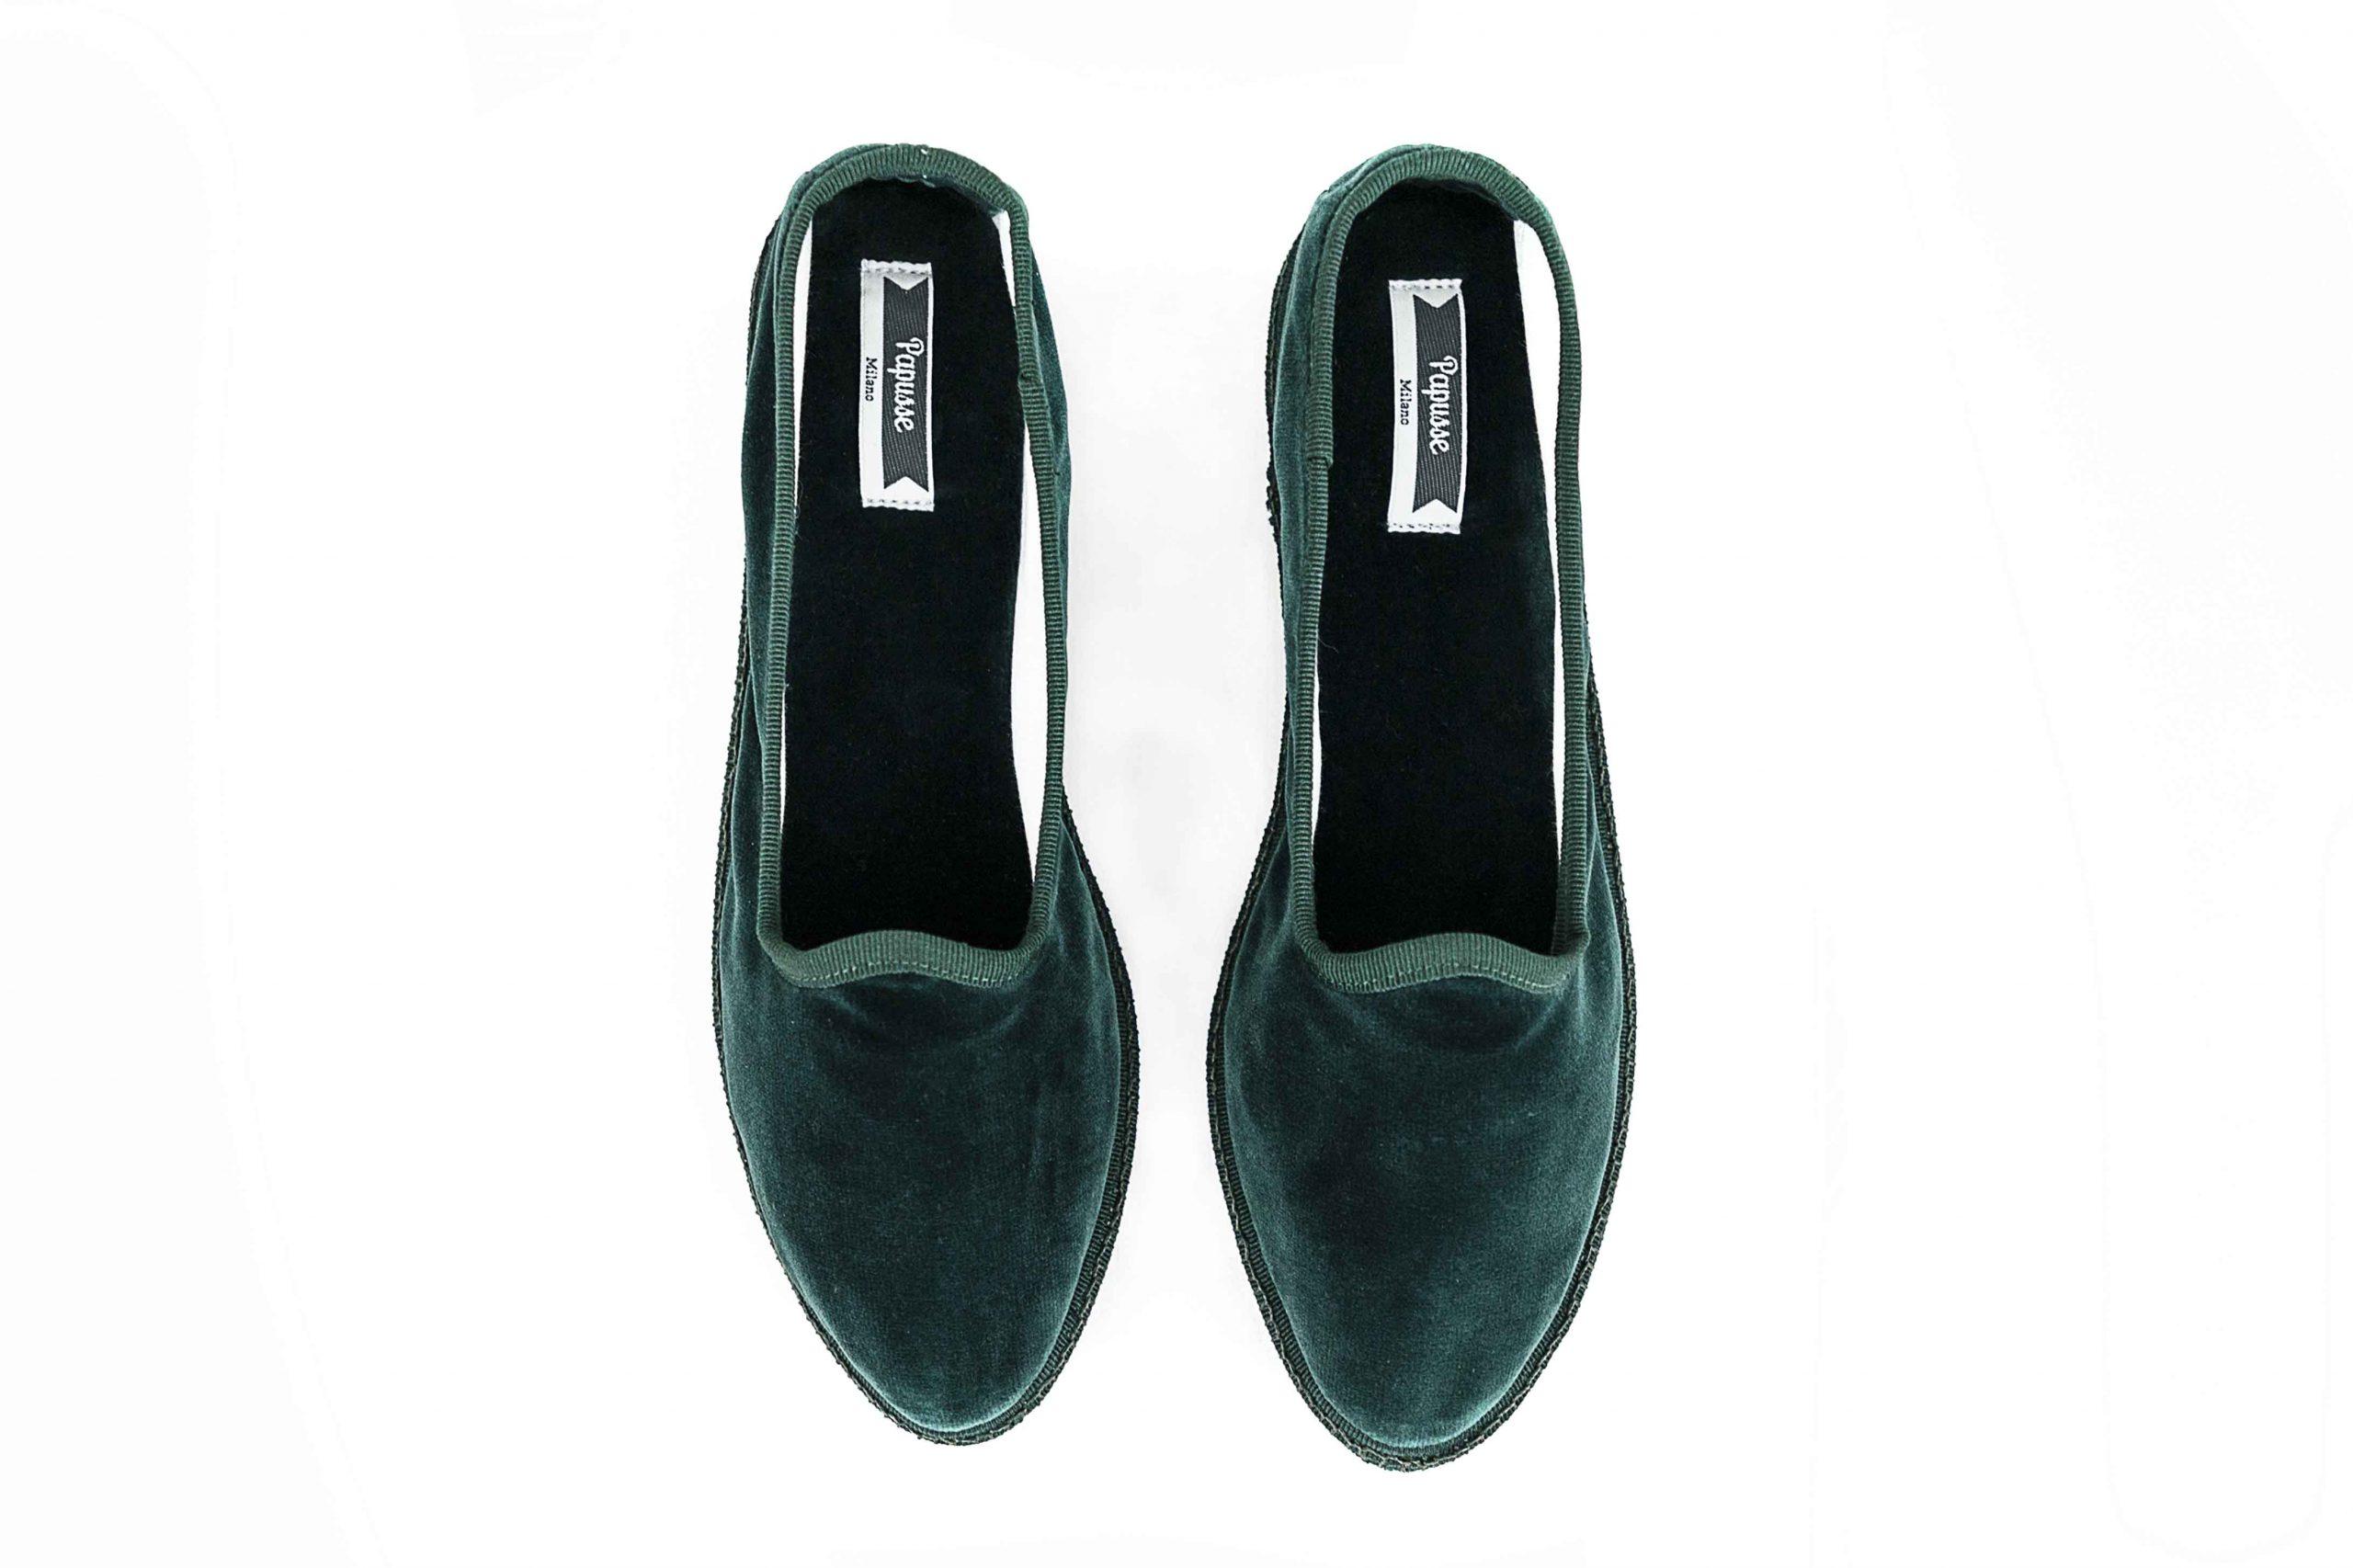 slippers_Verdiana_top